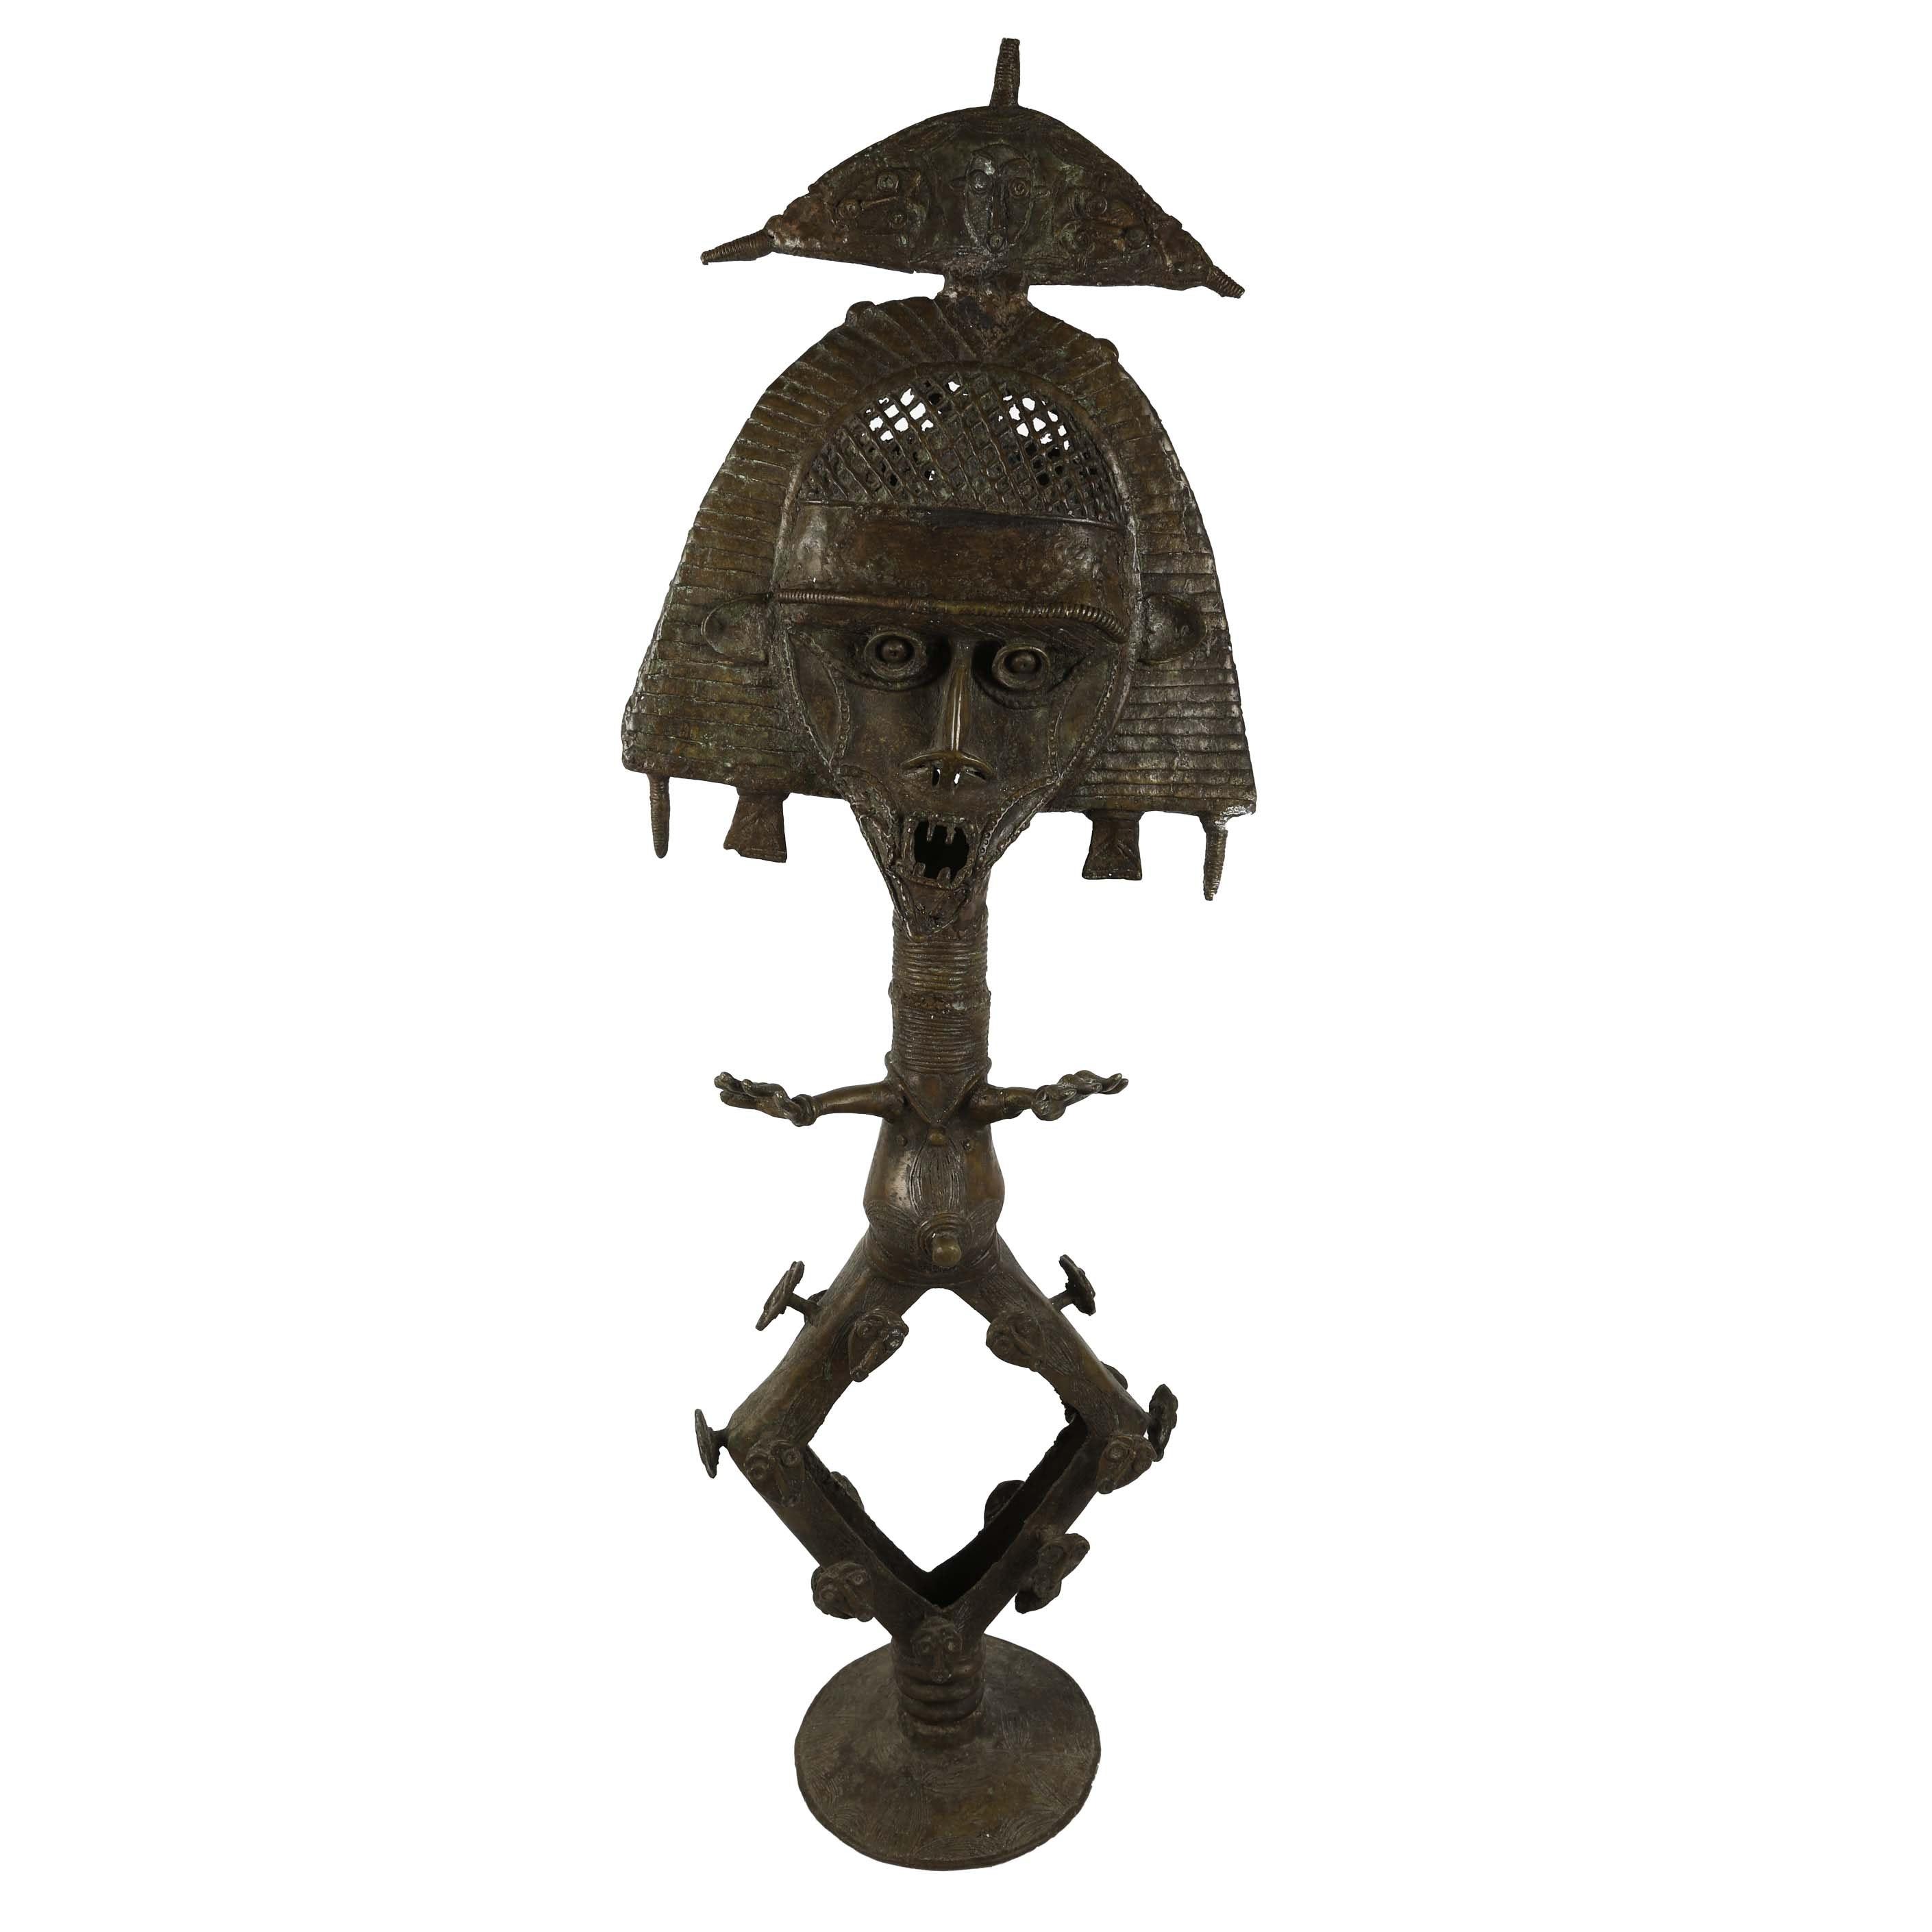 Kota Tribal Copper and Brass Reliquary Sculpture